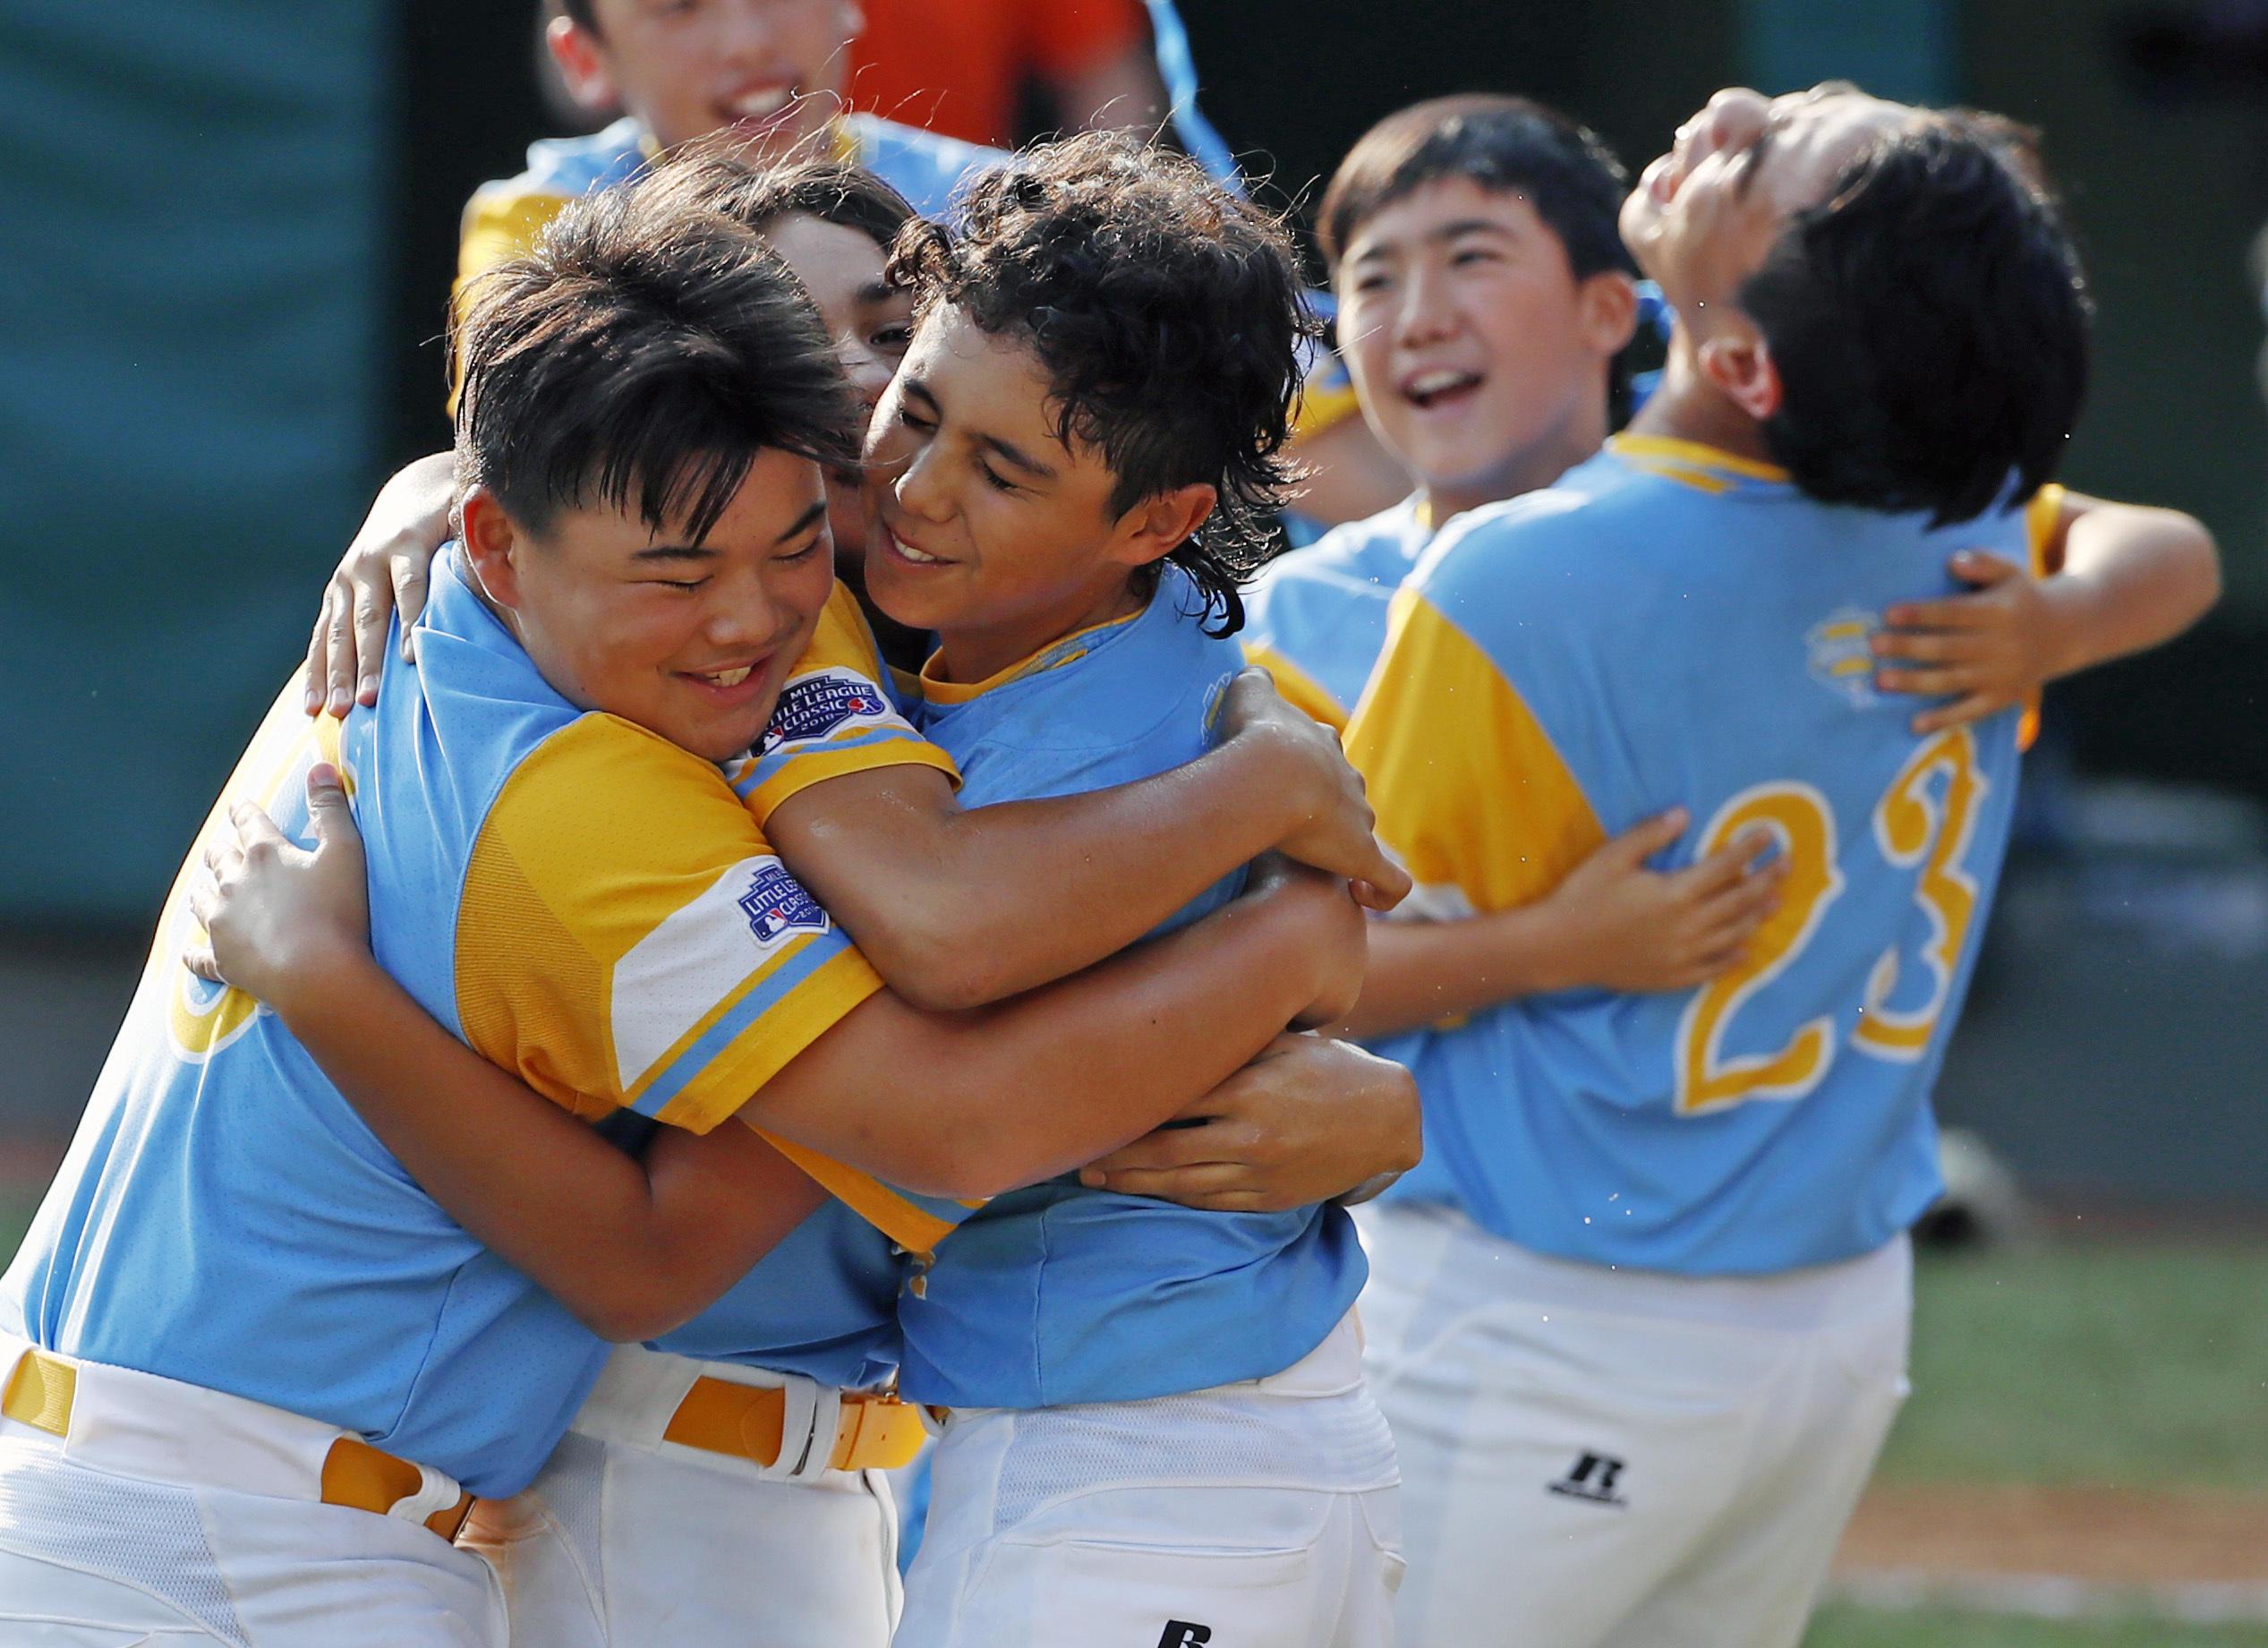 Hawaii wins 2018 Little League World Series championship